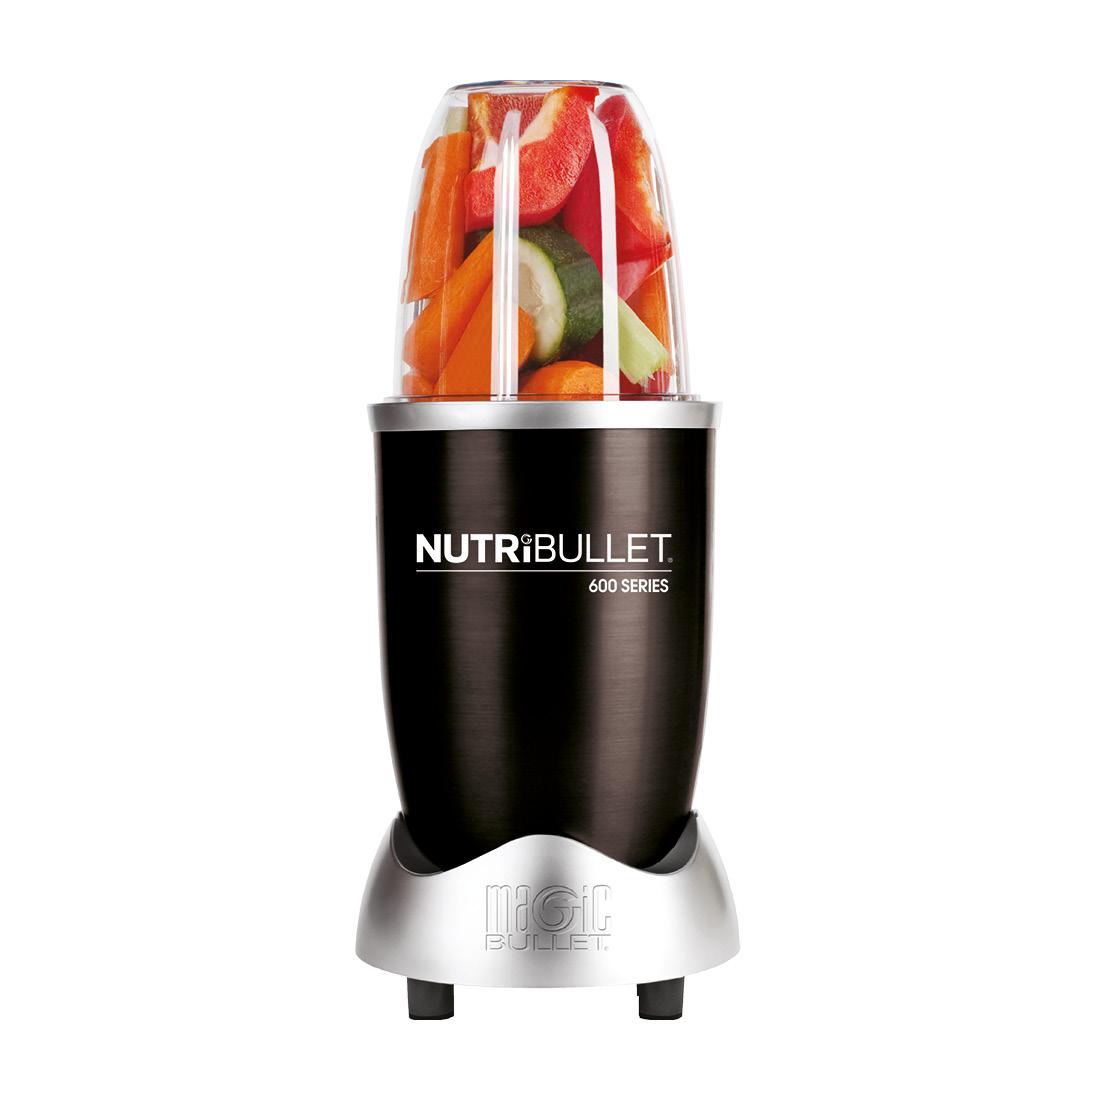 An image of Nutribullet 8pc - Black